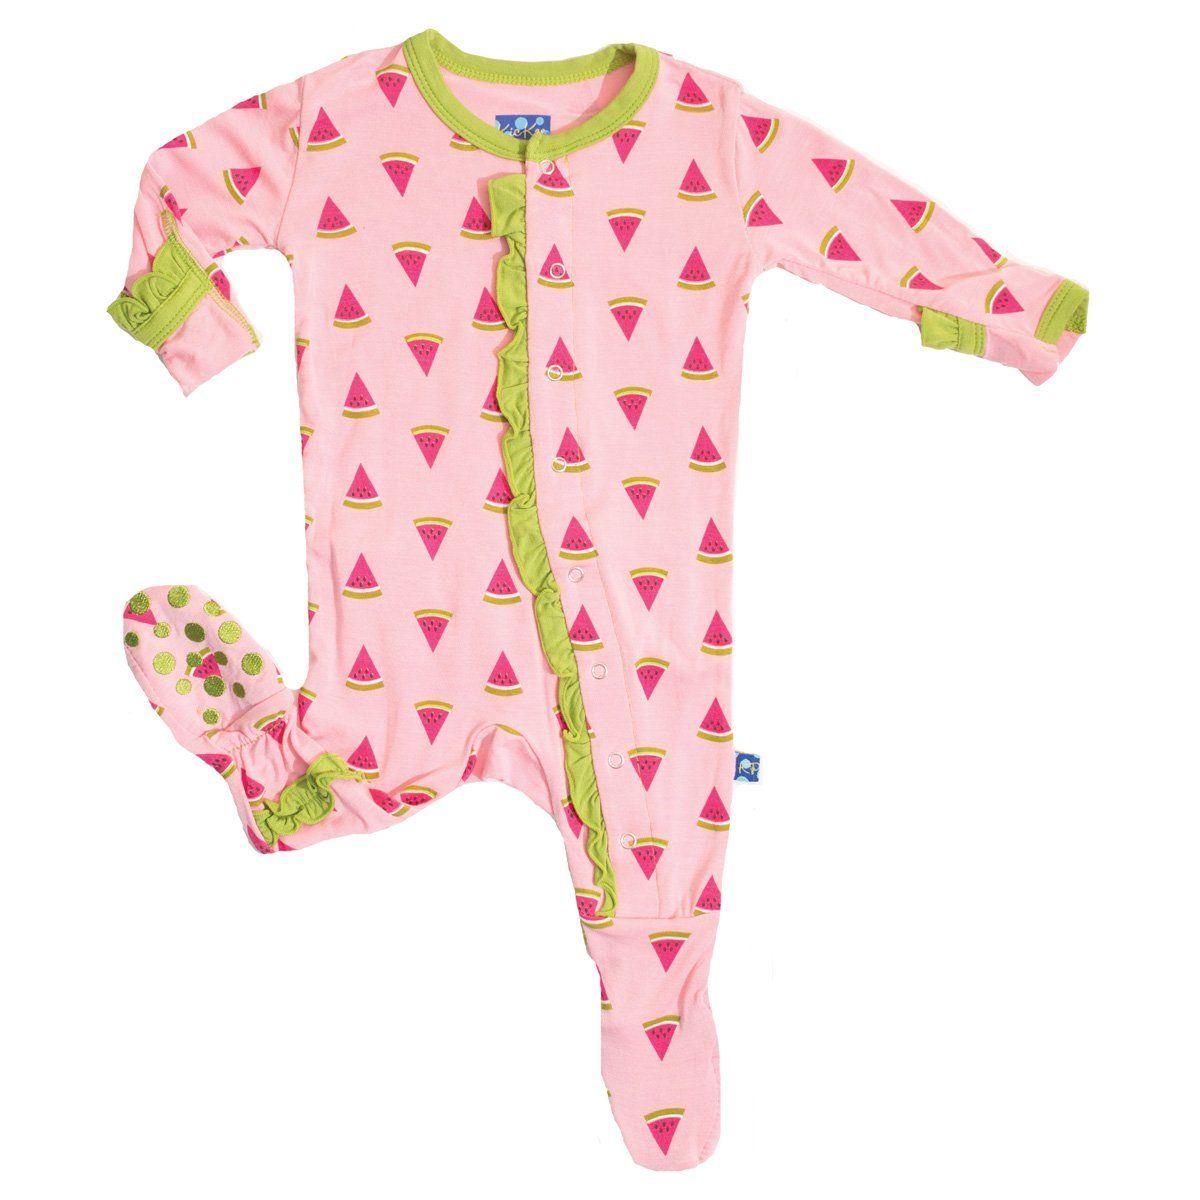 32a271b2b KicKee Pants Baby Girls